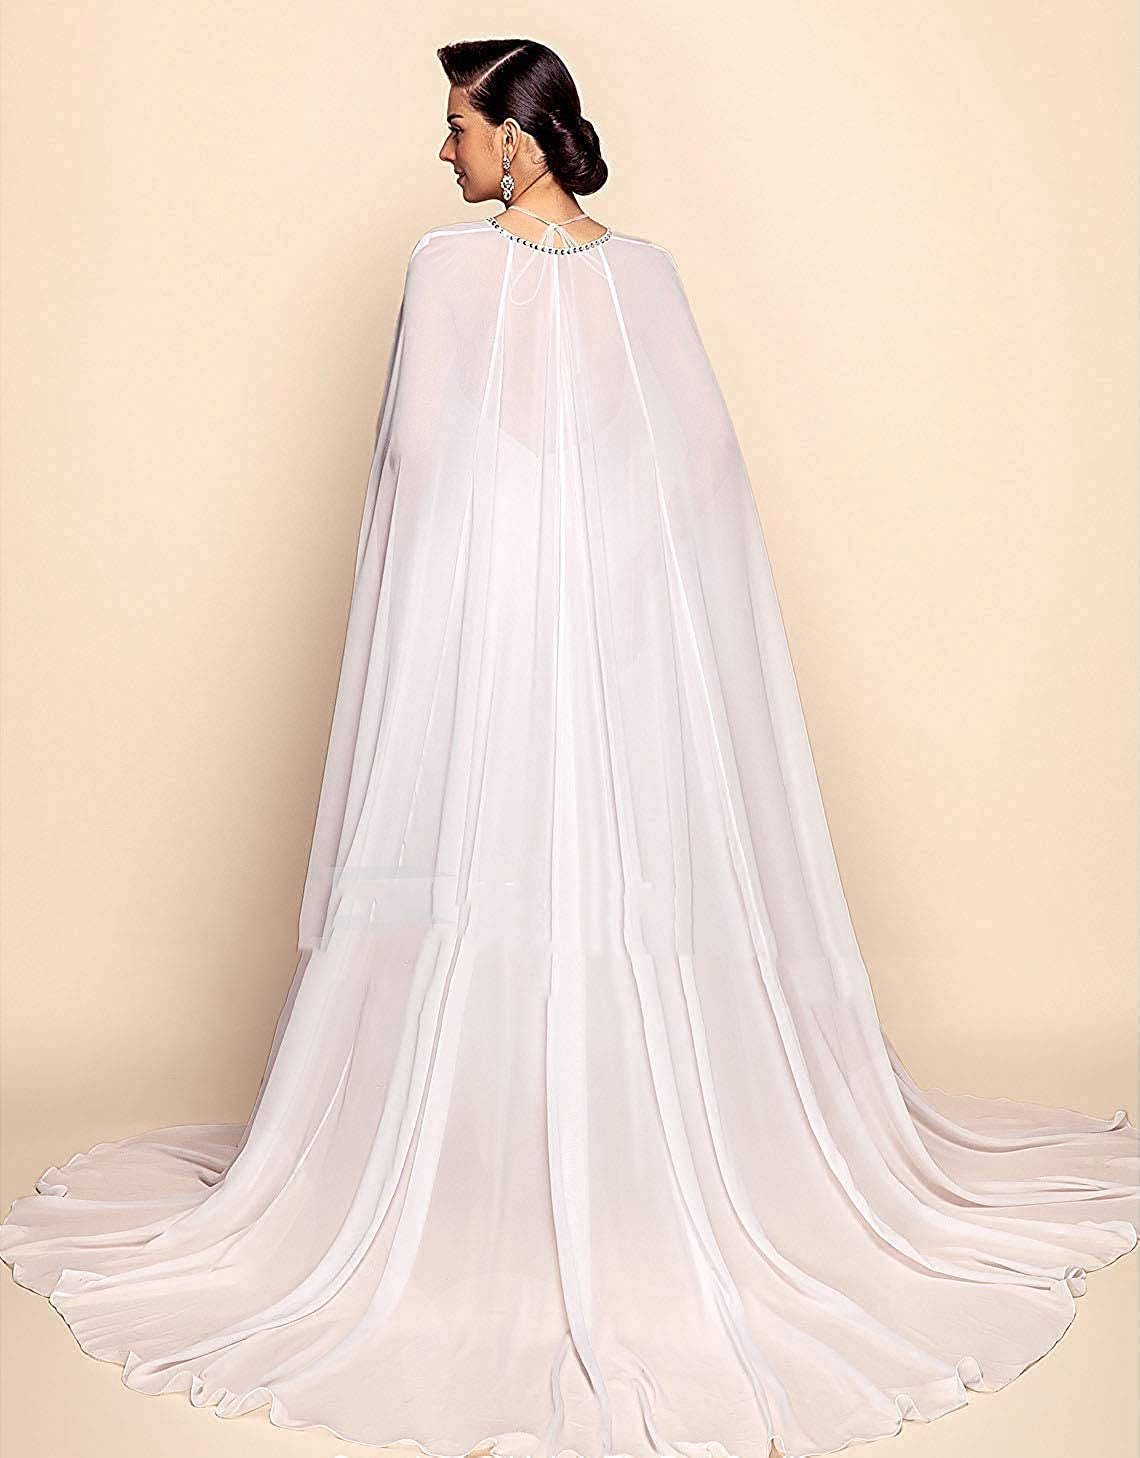 Cibelle Womens Chiffon Beading 3 Meters Long Wedding Cloak Bridal Cape